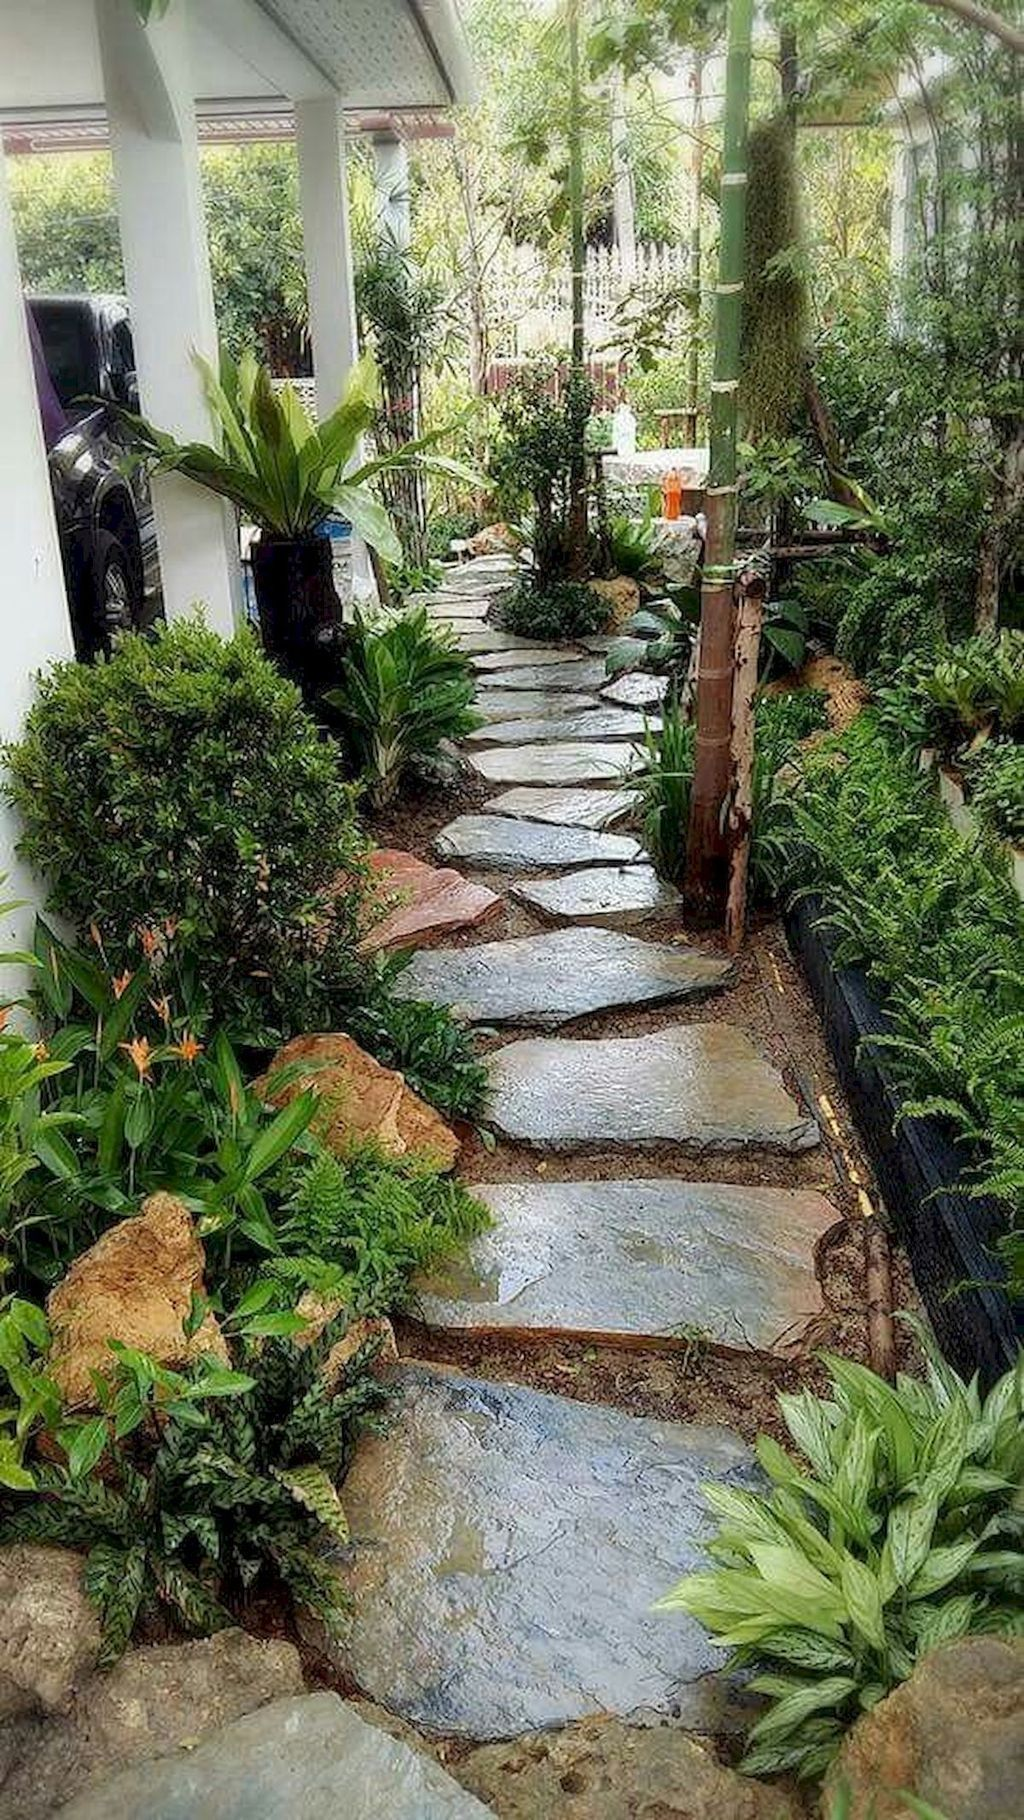 backyard landscaping ideas with minimum budget with on backyard landscaping ideas with minimum budget id=34914